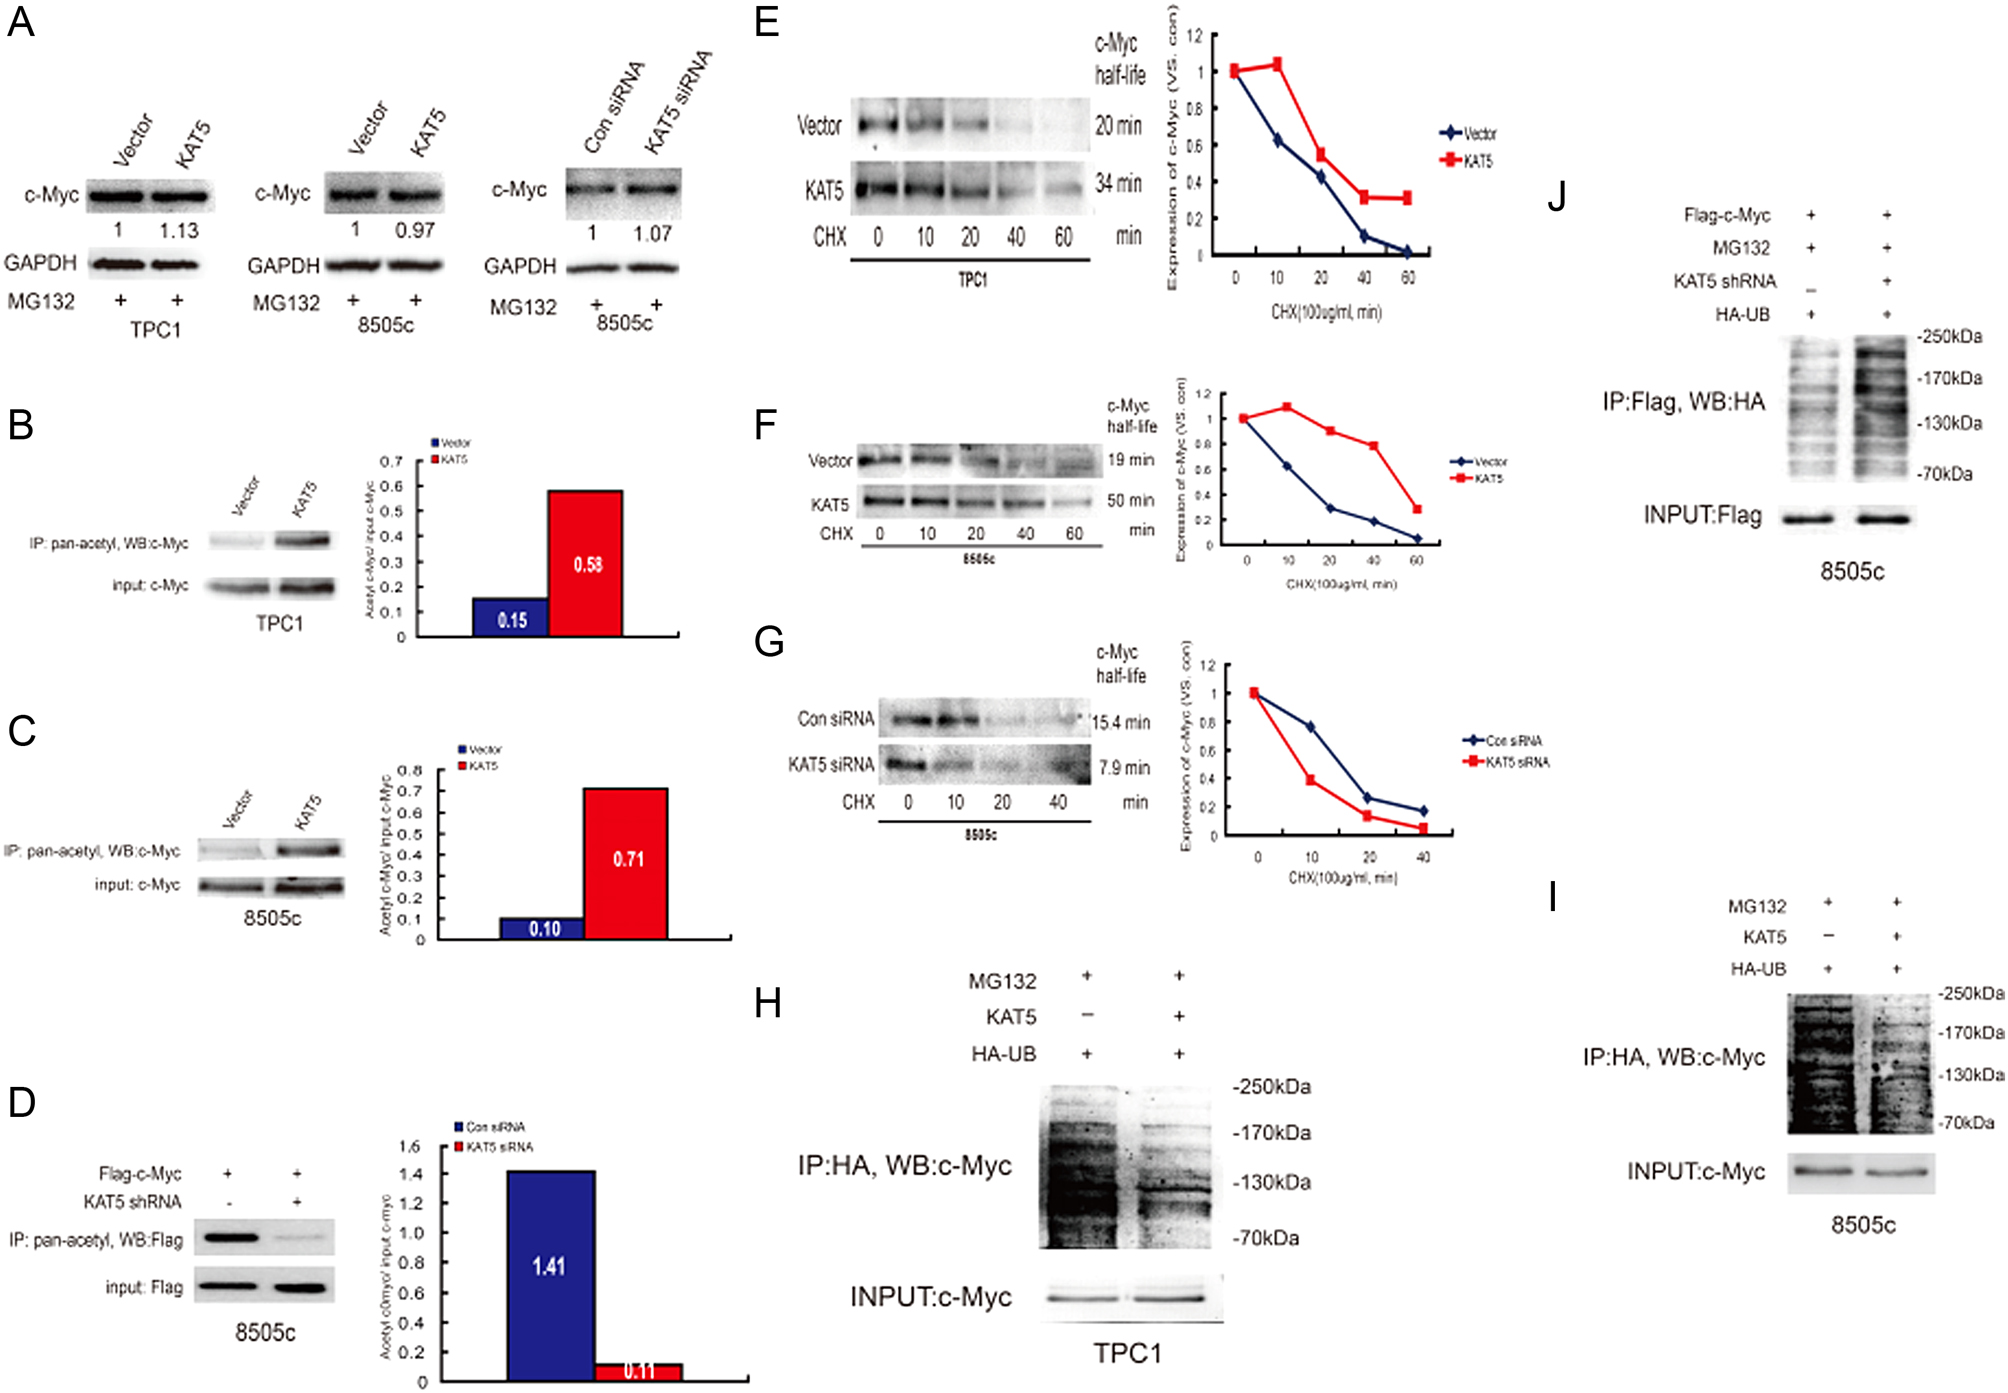 KAT5 promotes invasion and metastasis through C-MYC